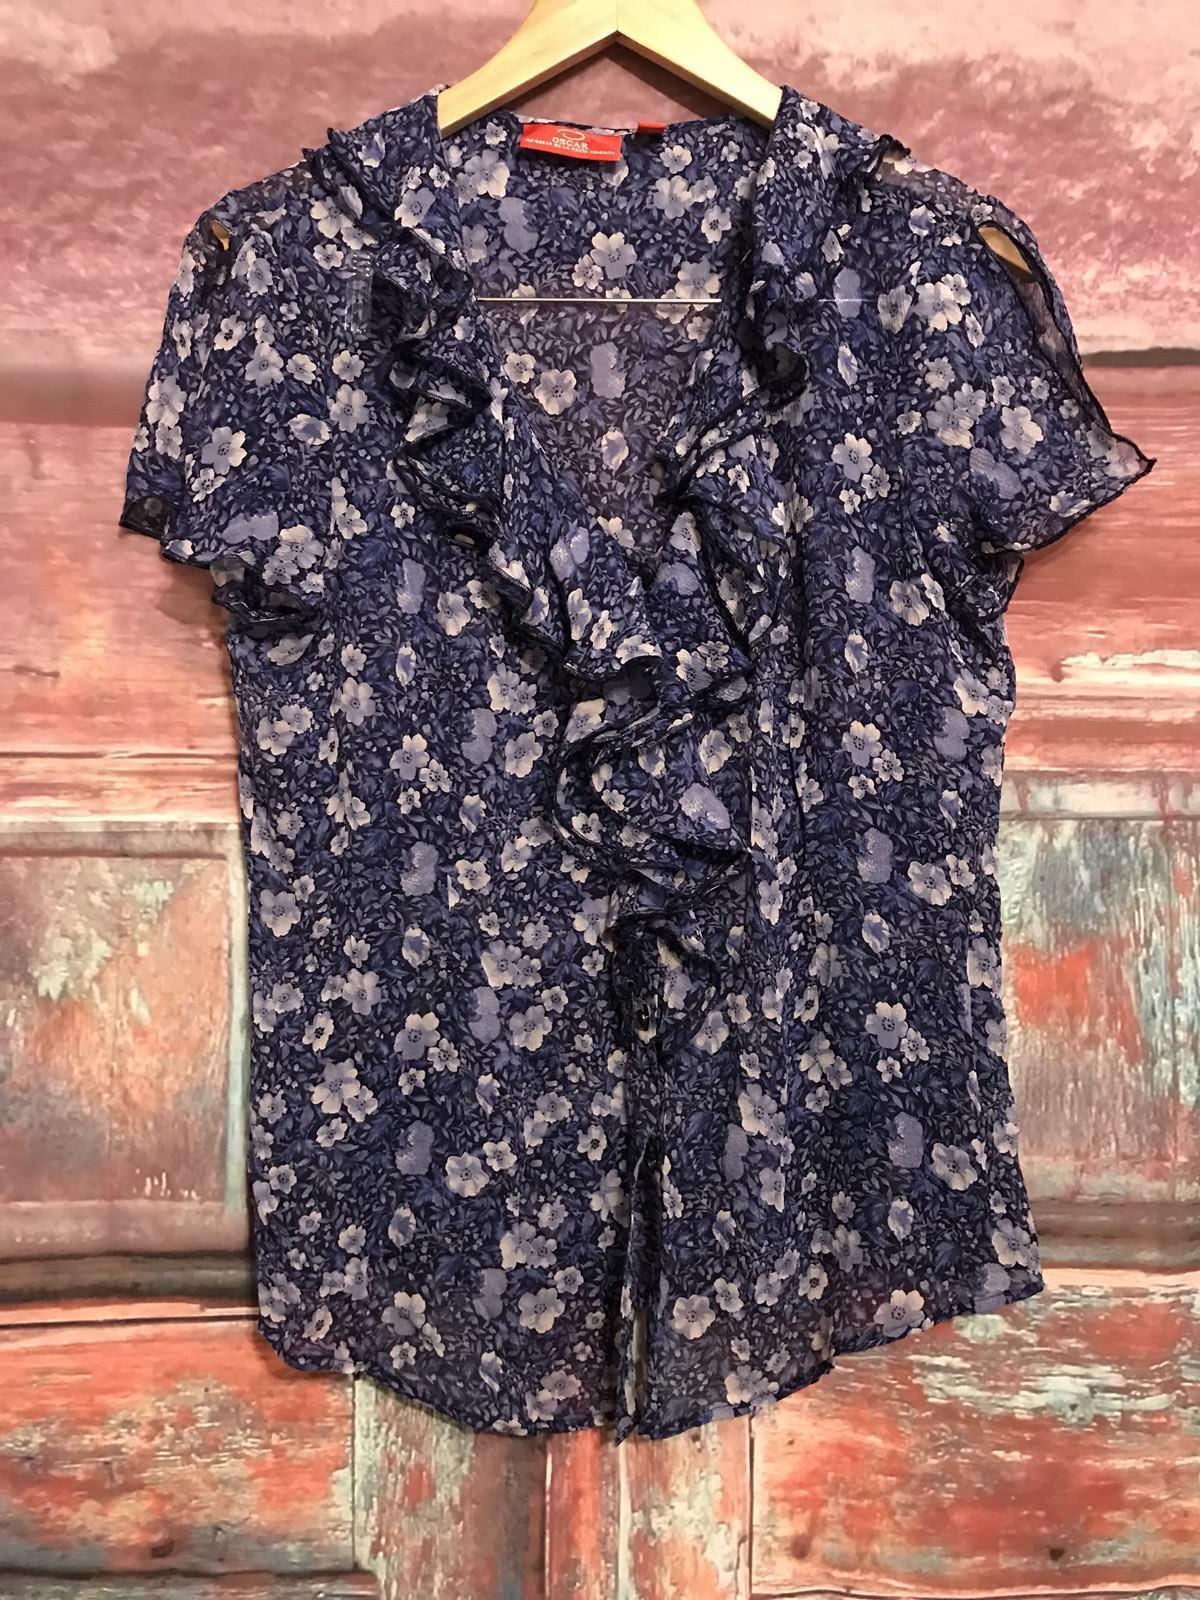 Oscar de la Renta schwarz Blau Weiß Silk Floral Button Down Ruffled Blouse 14 Cl7